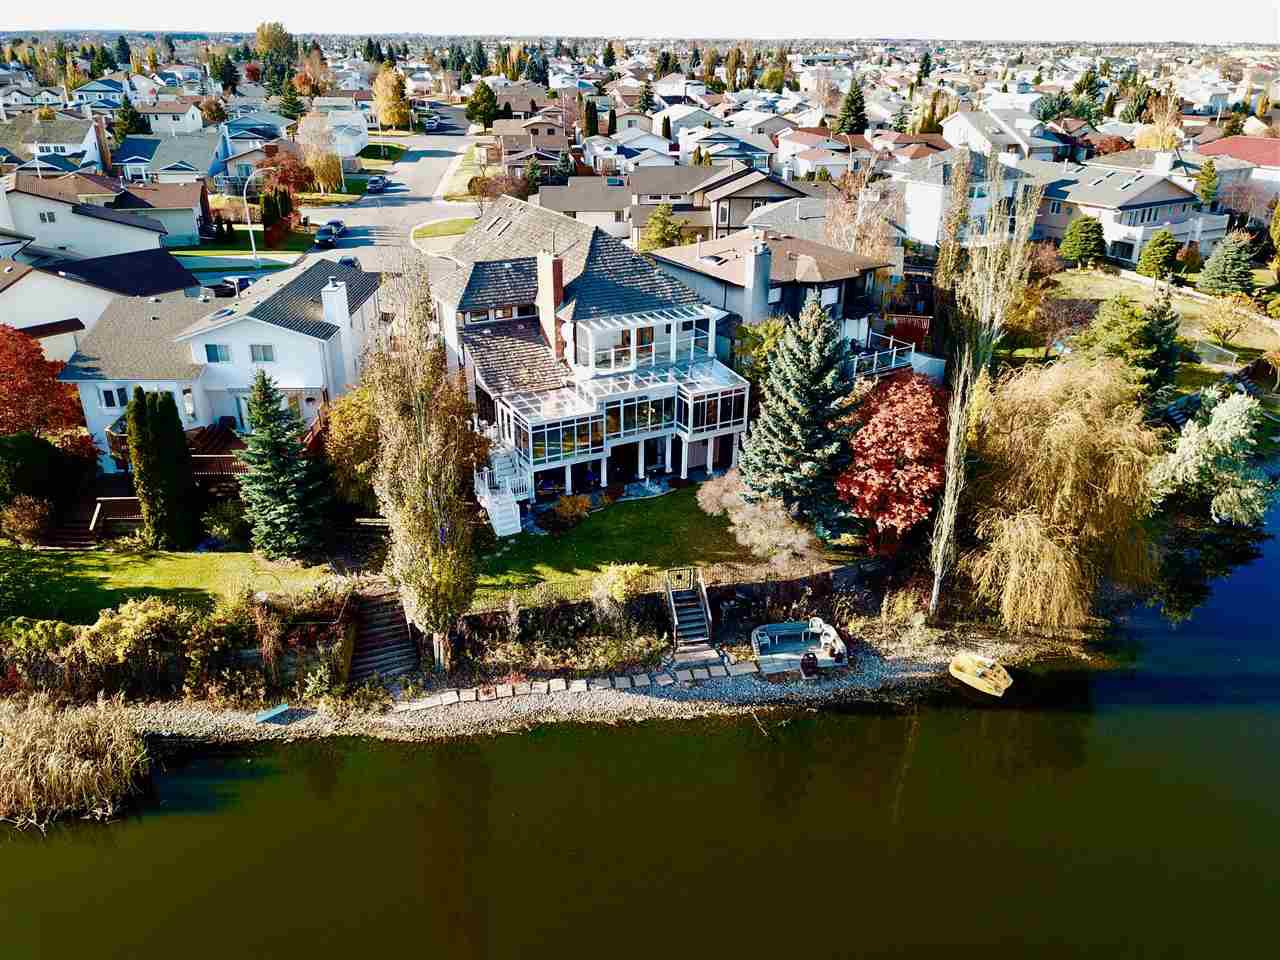 Main Photo: 7604 157 Avenue in Edmonton: Zone 28 House for sale : MLS®# E4178361